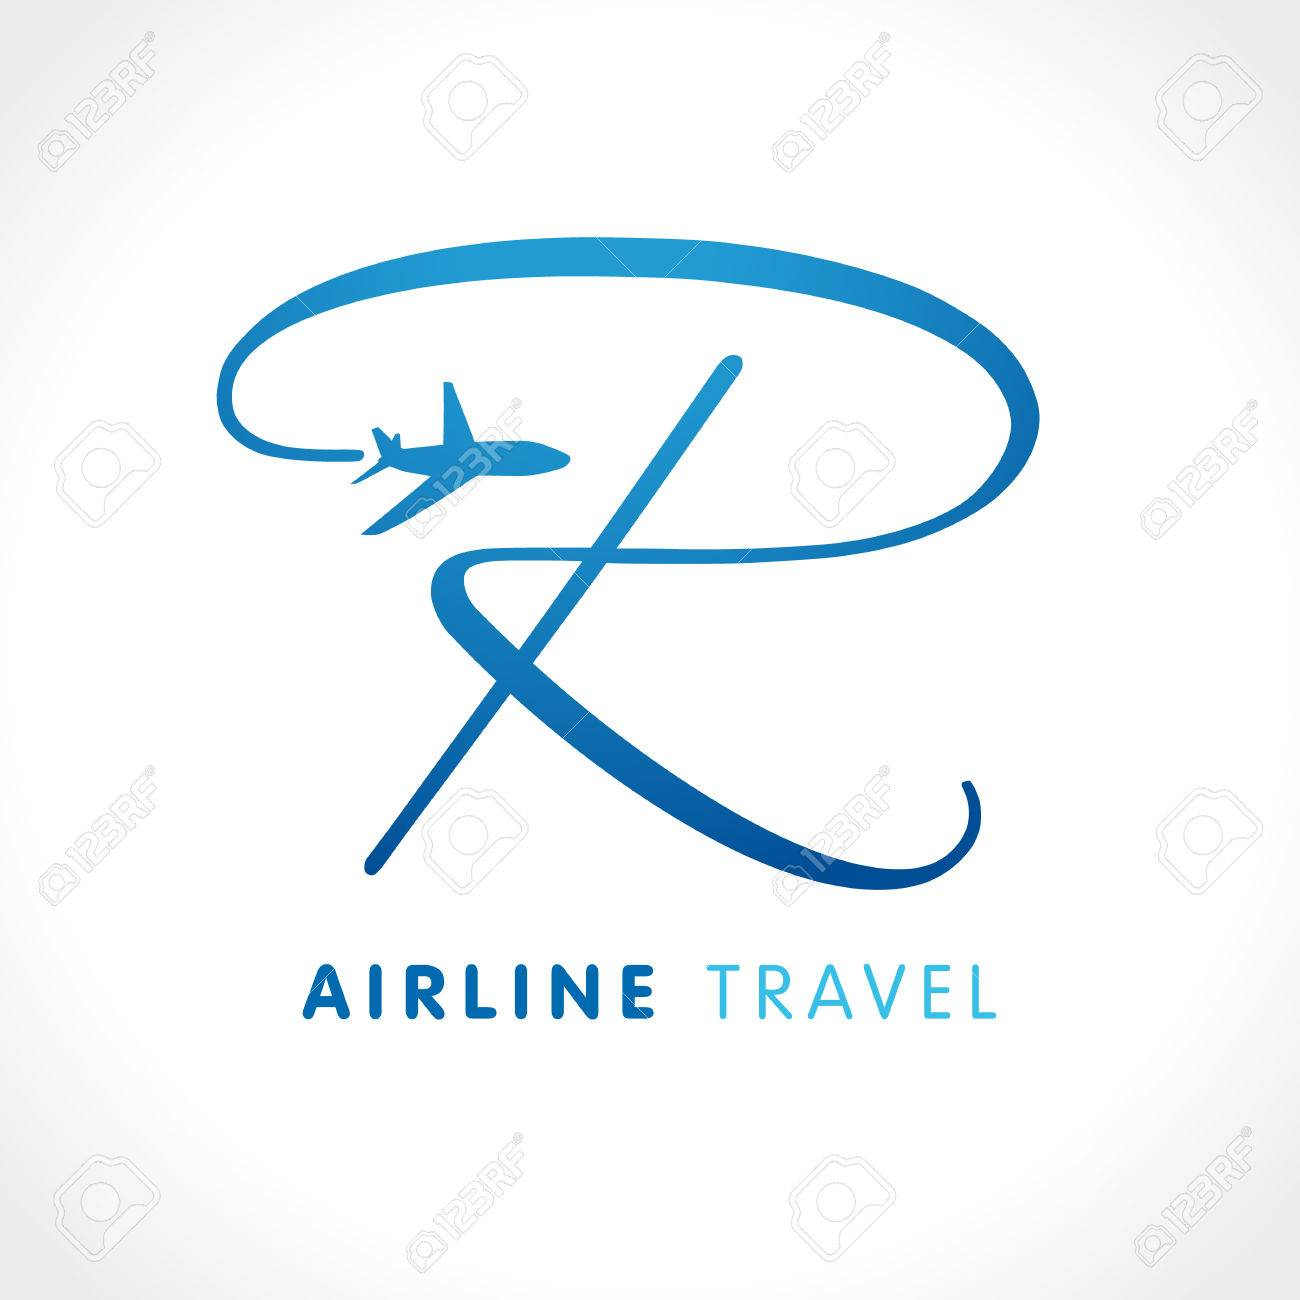 r letter travel company logo airline business travel logo design